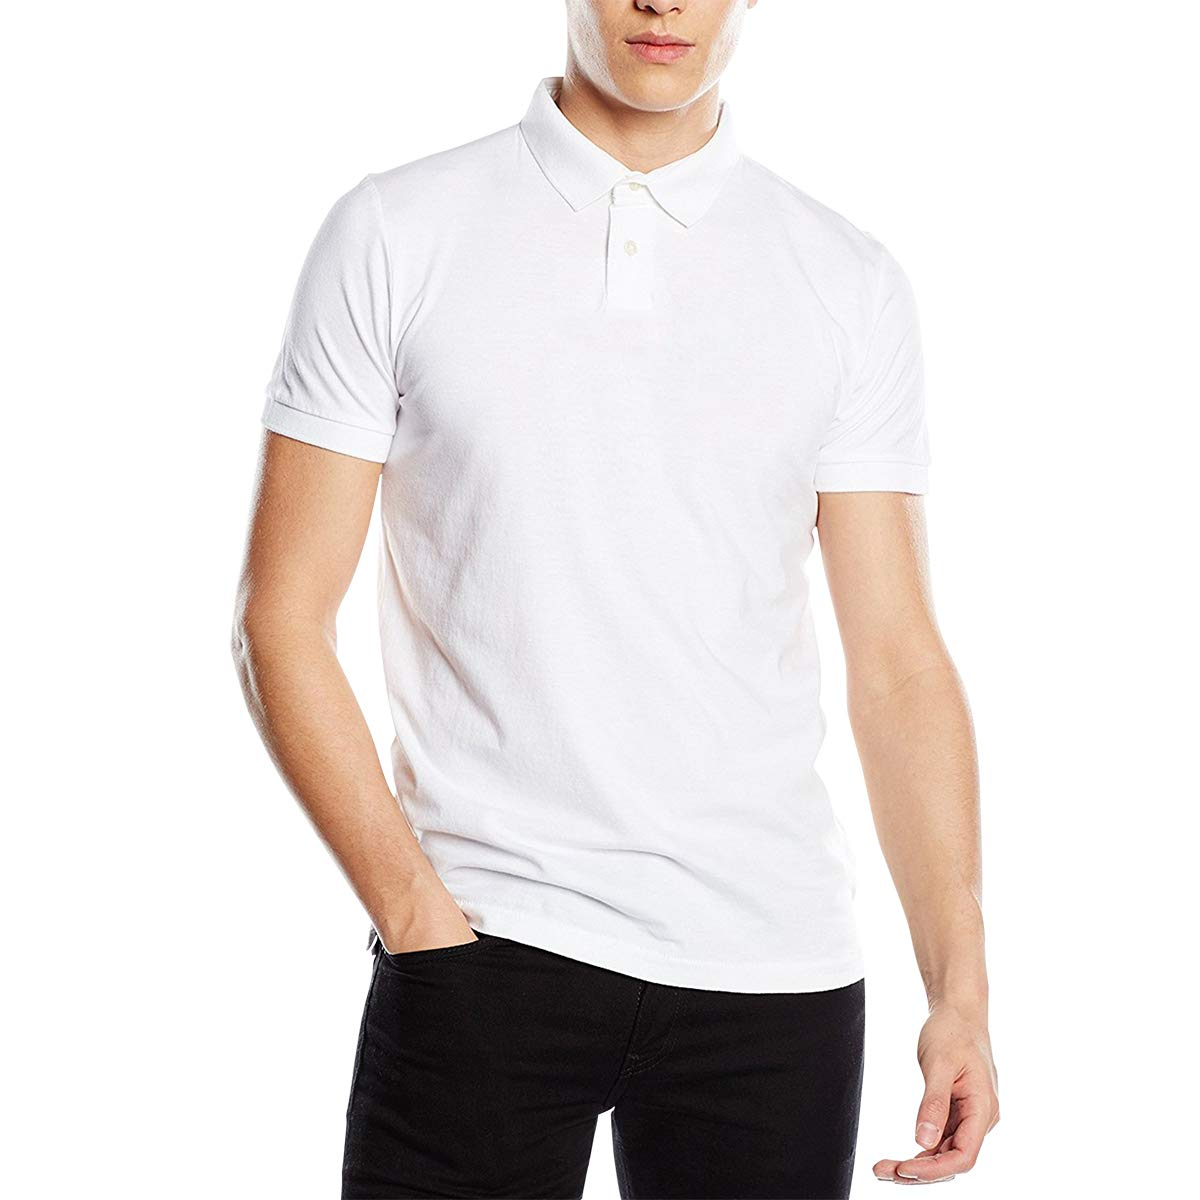 Q64 Sacred Geometry Mens Short-Sleeve Polo T Shirt